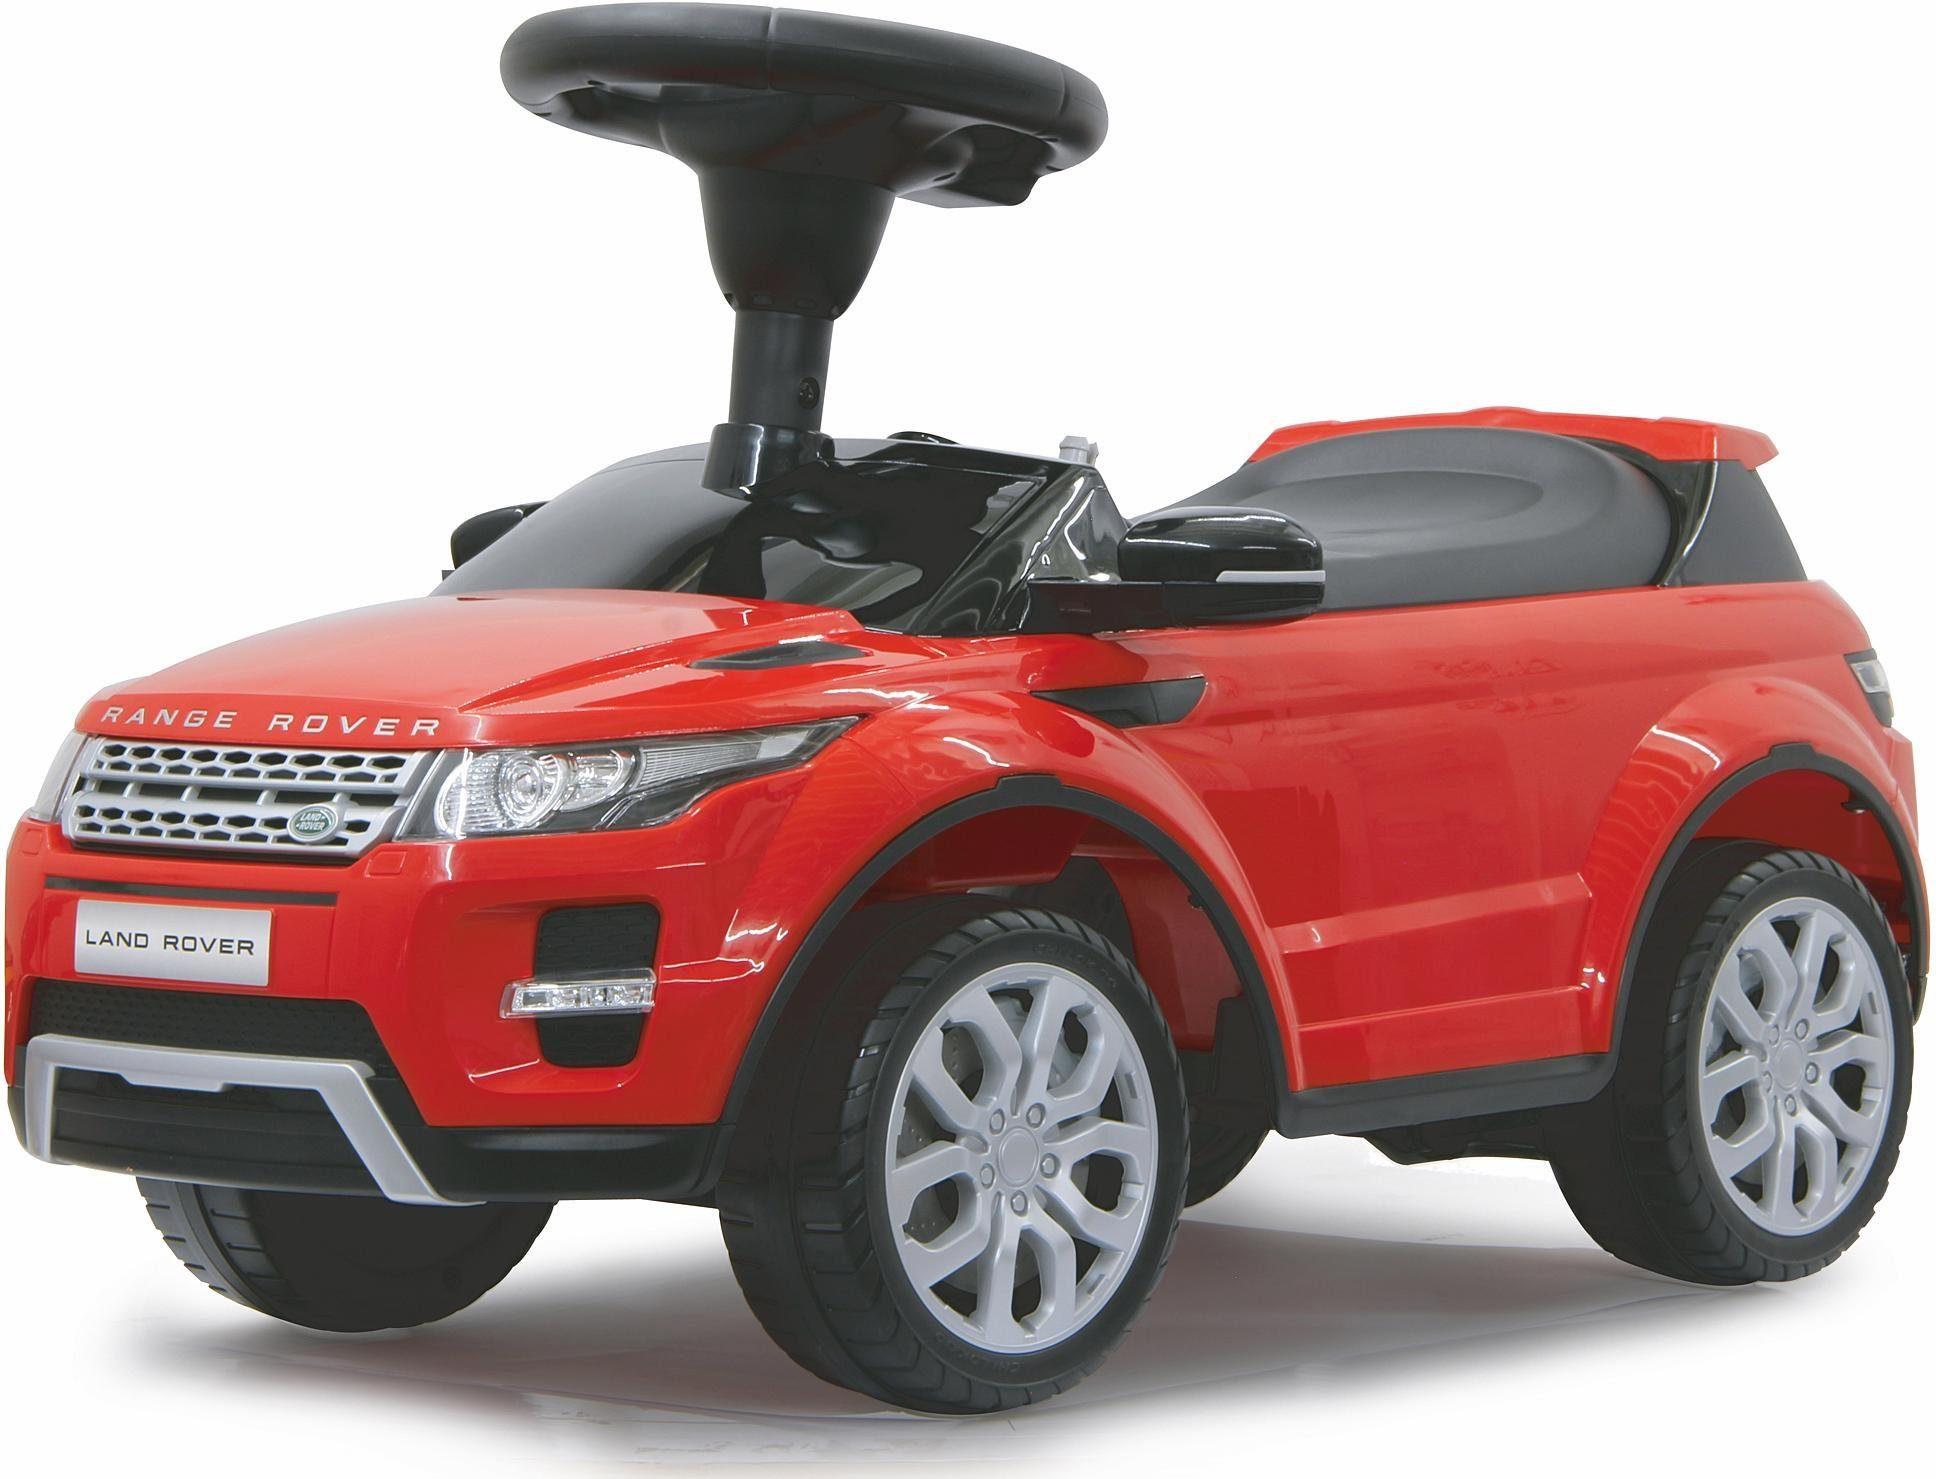 JAMARA Rutscherauto, »JAMARA KIDS Land Rover Evoque rot«